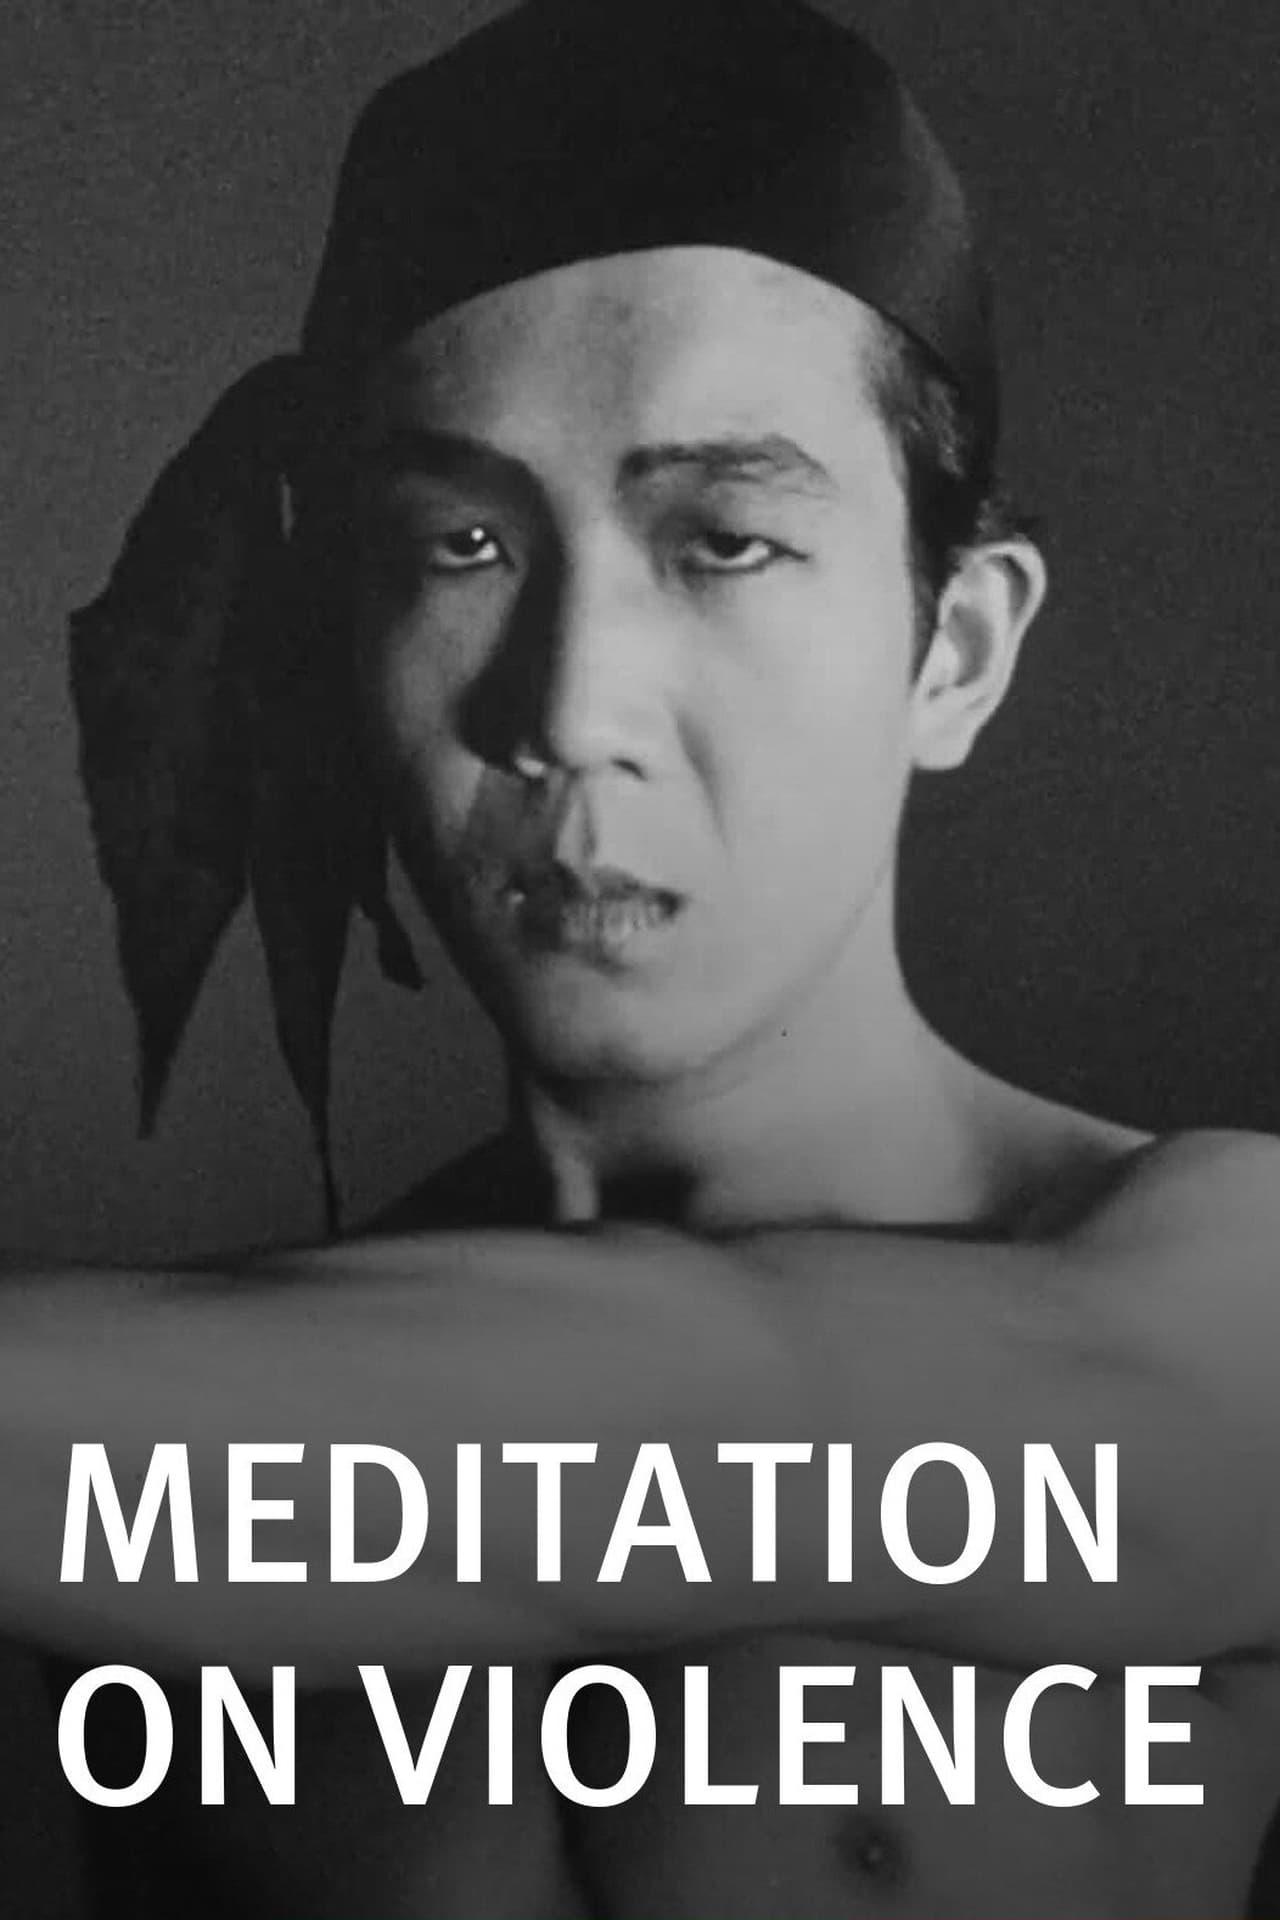 Meditation on Violence (1949)